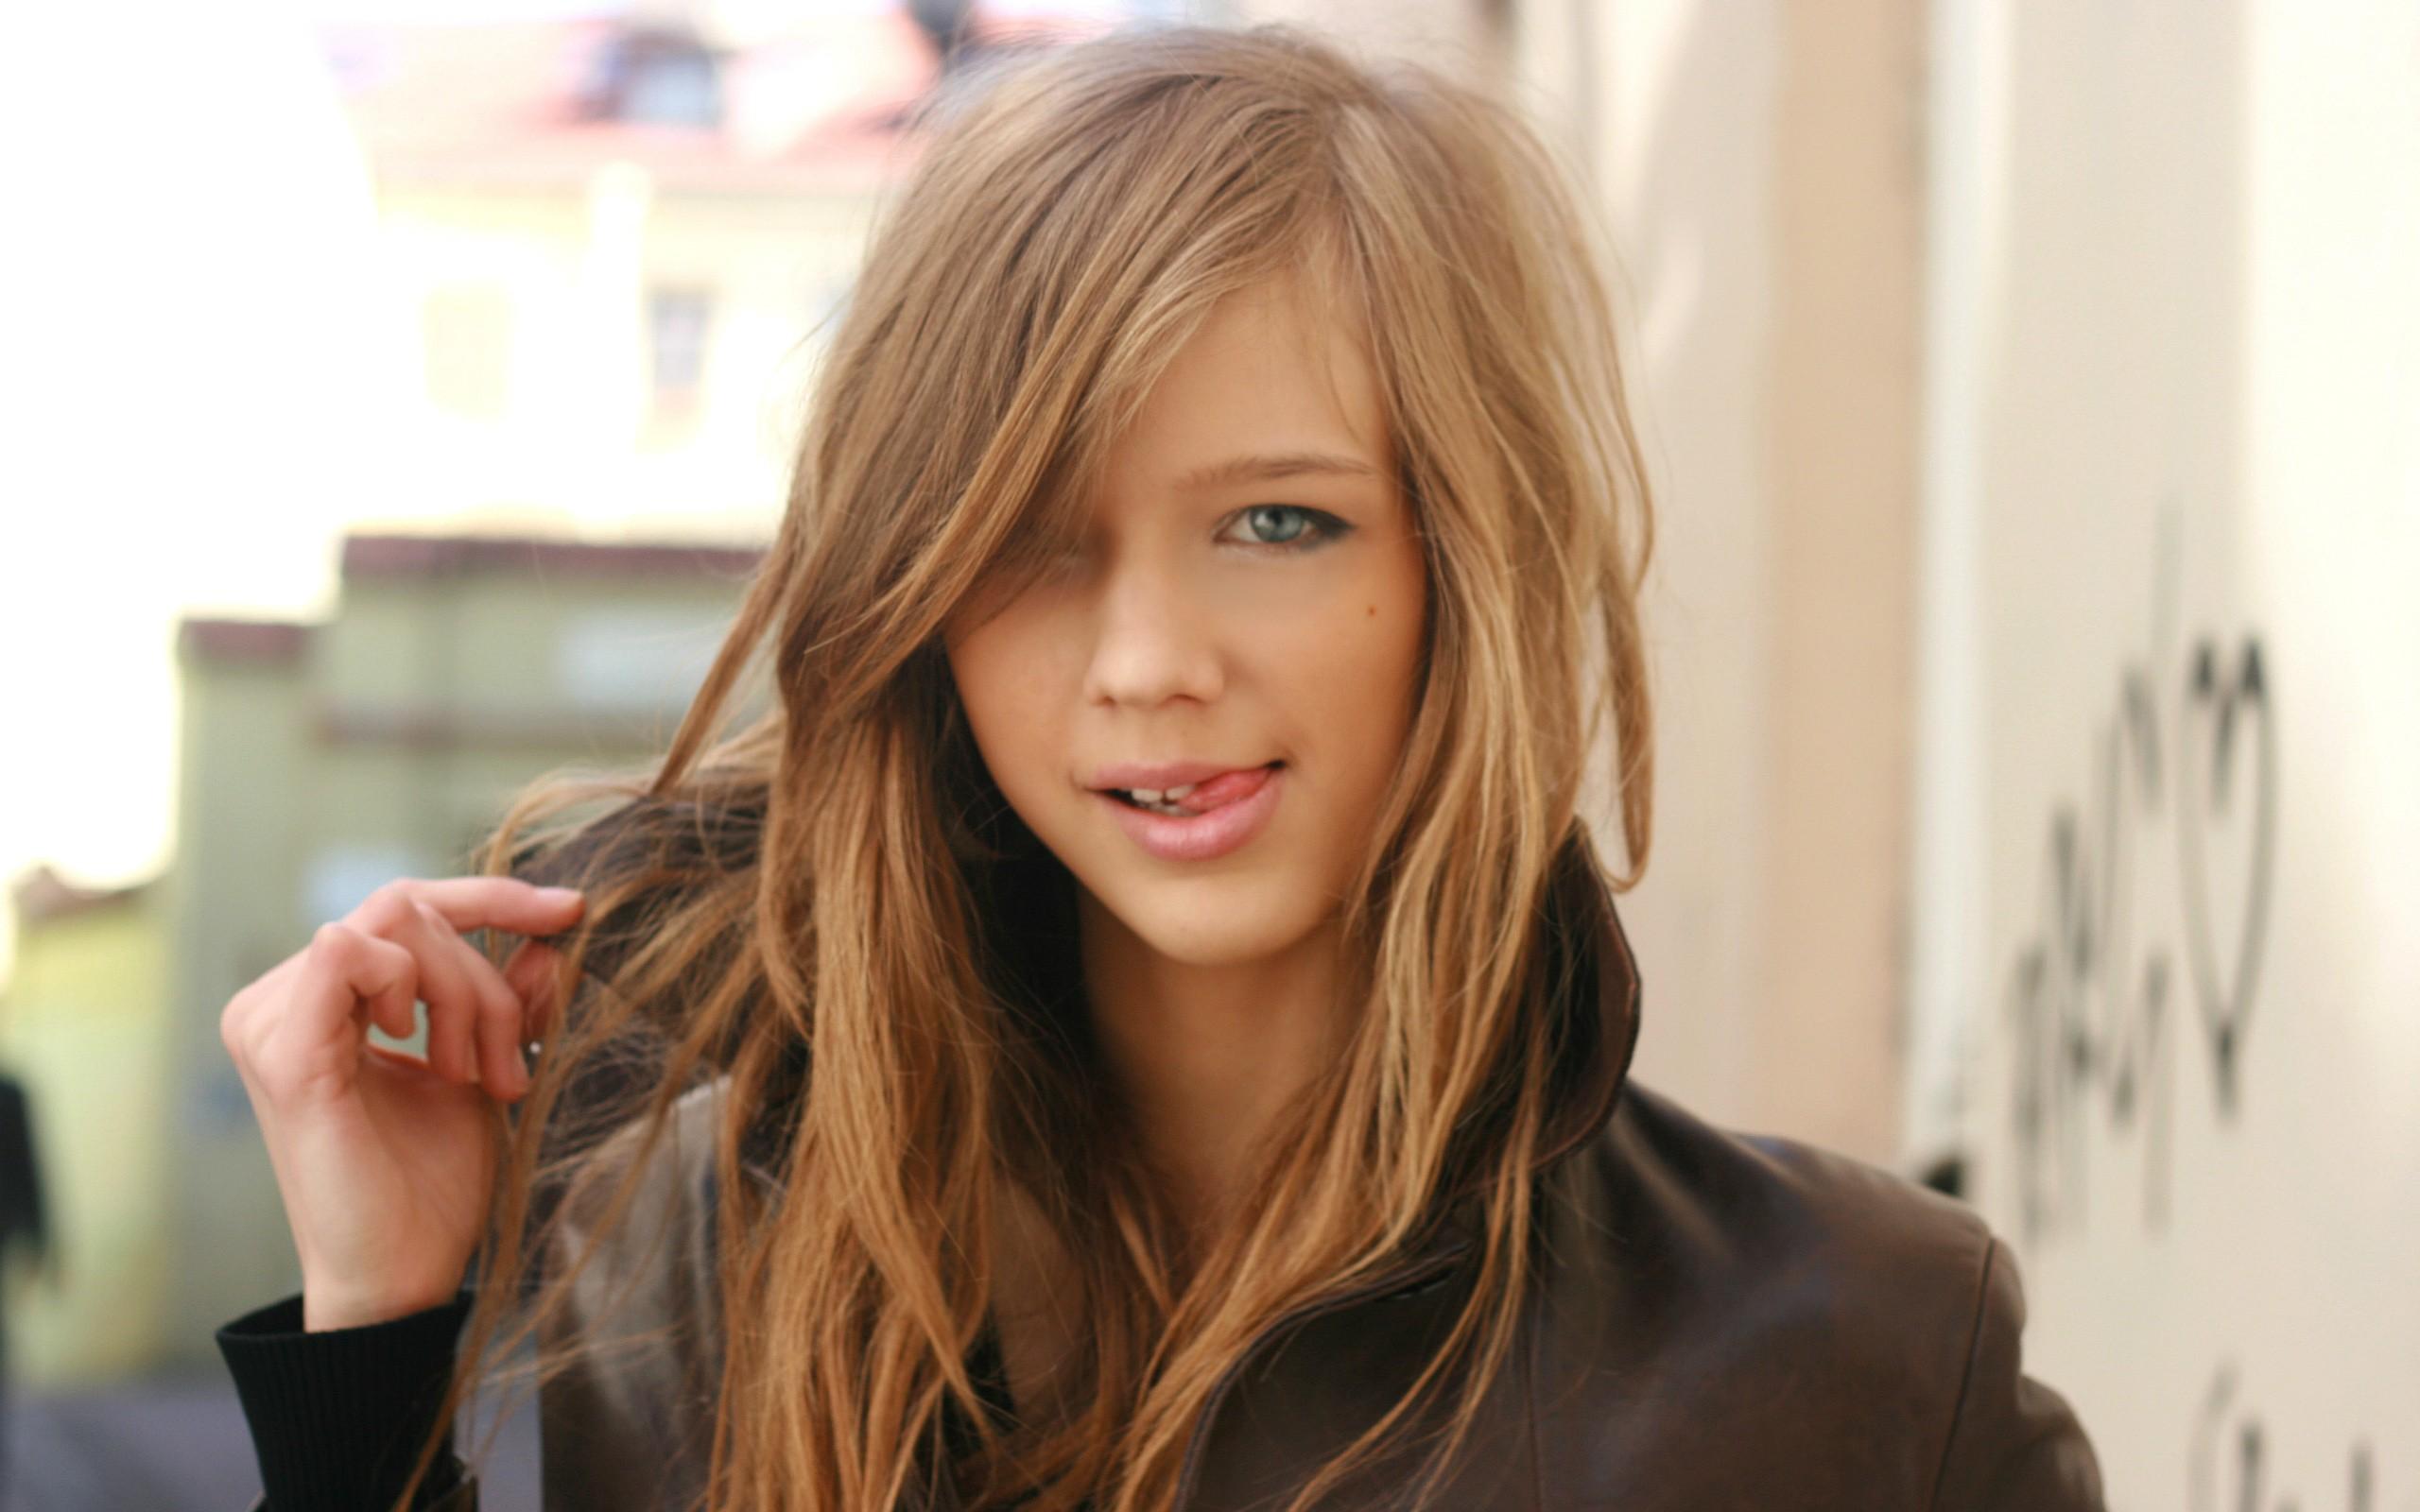 Blonde Girls Wallpaper2